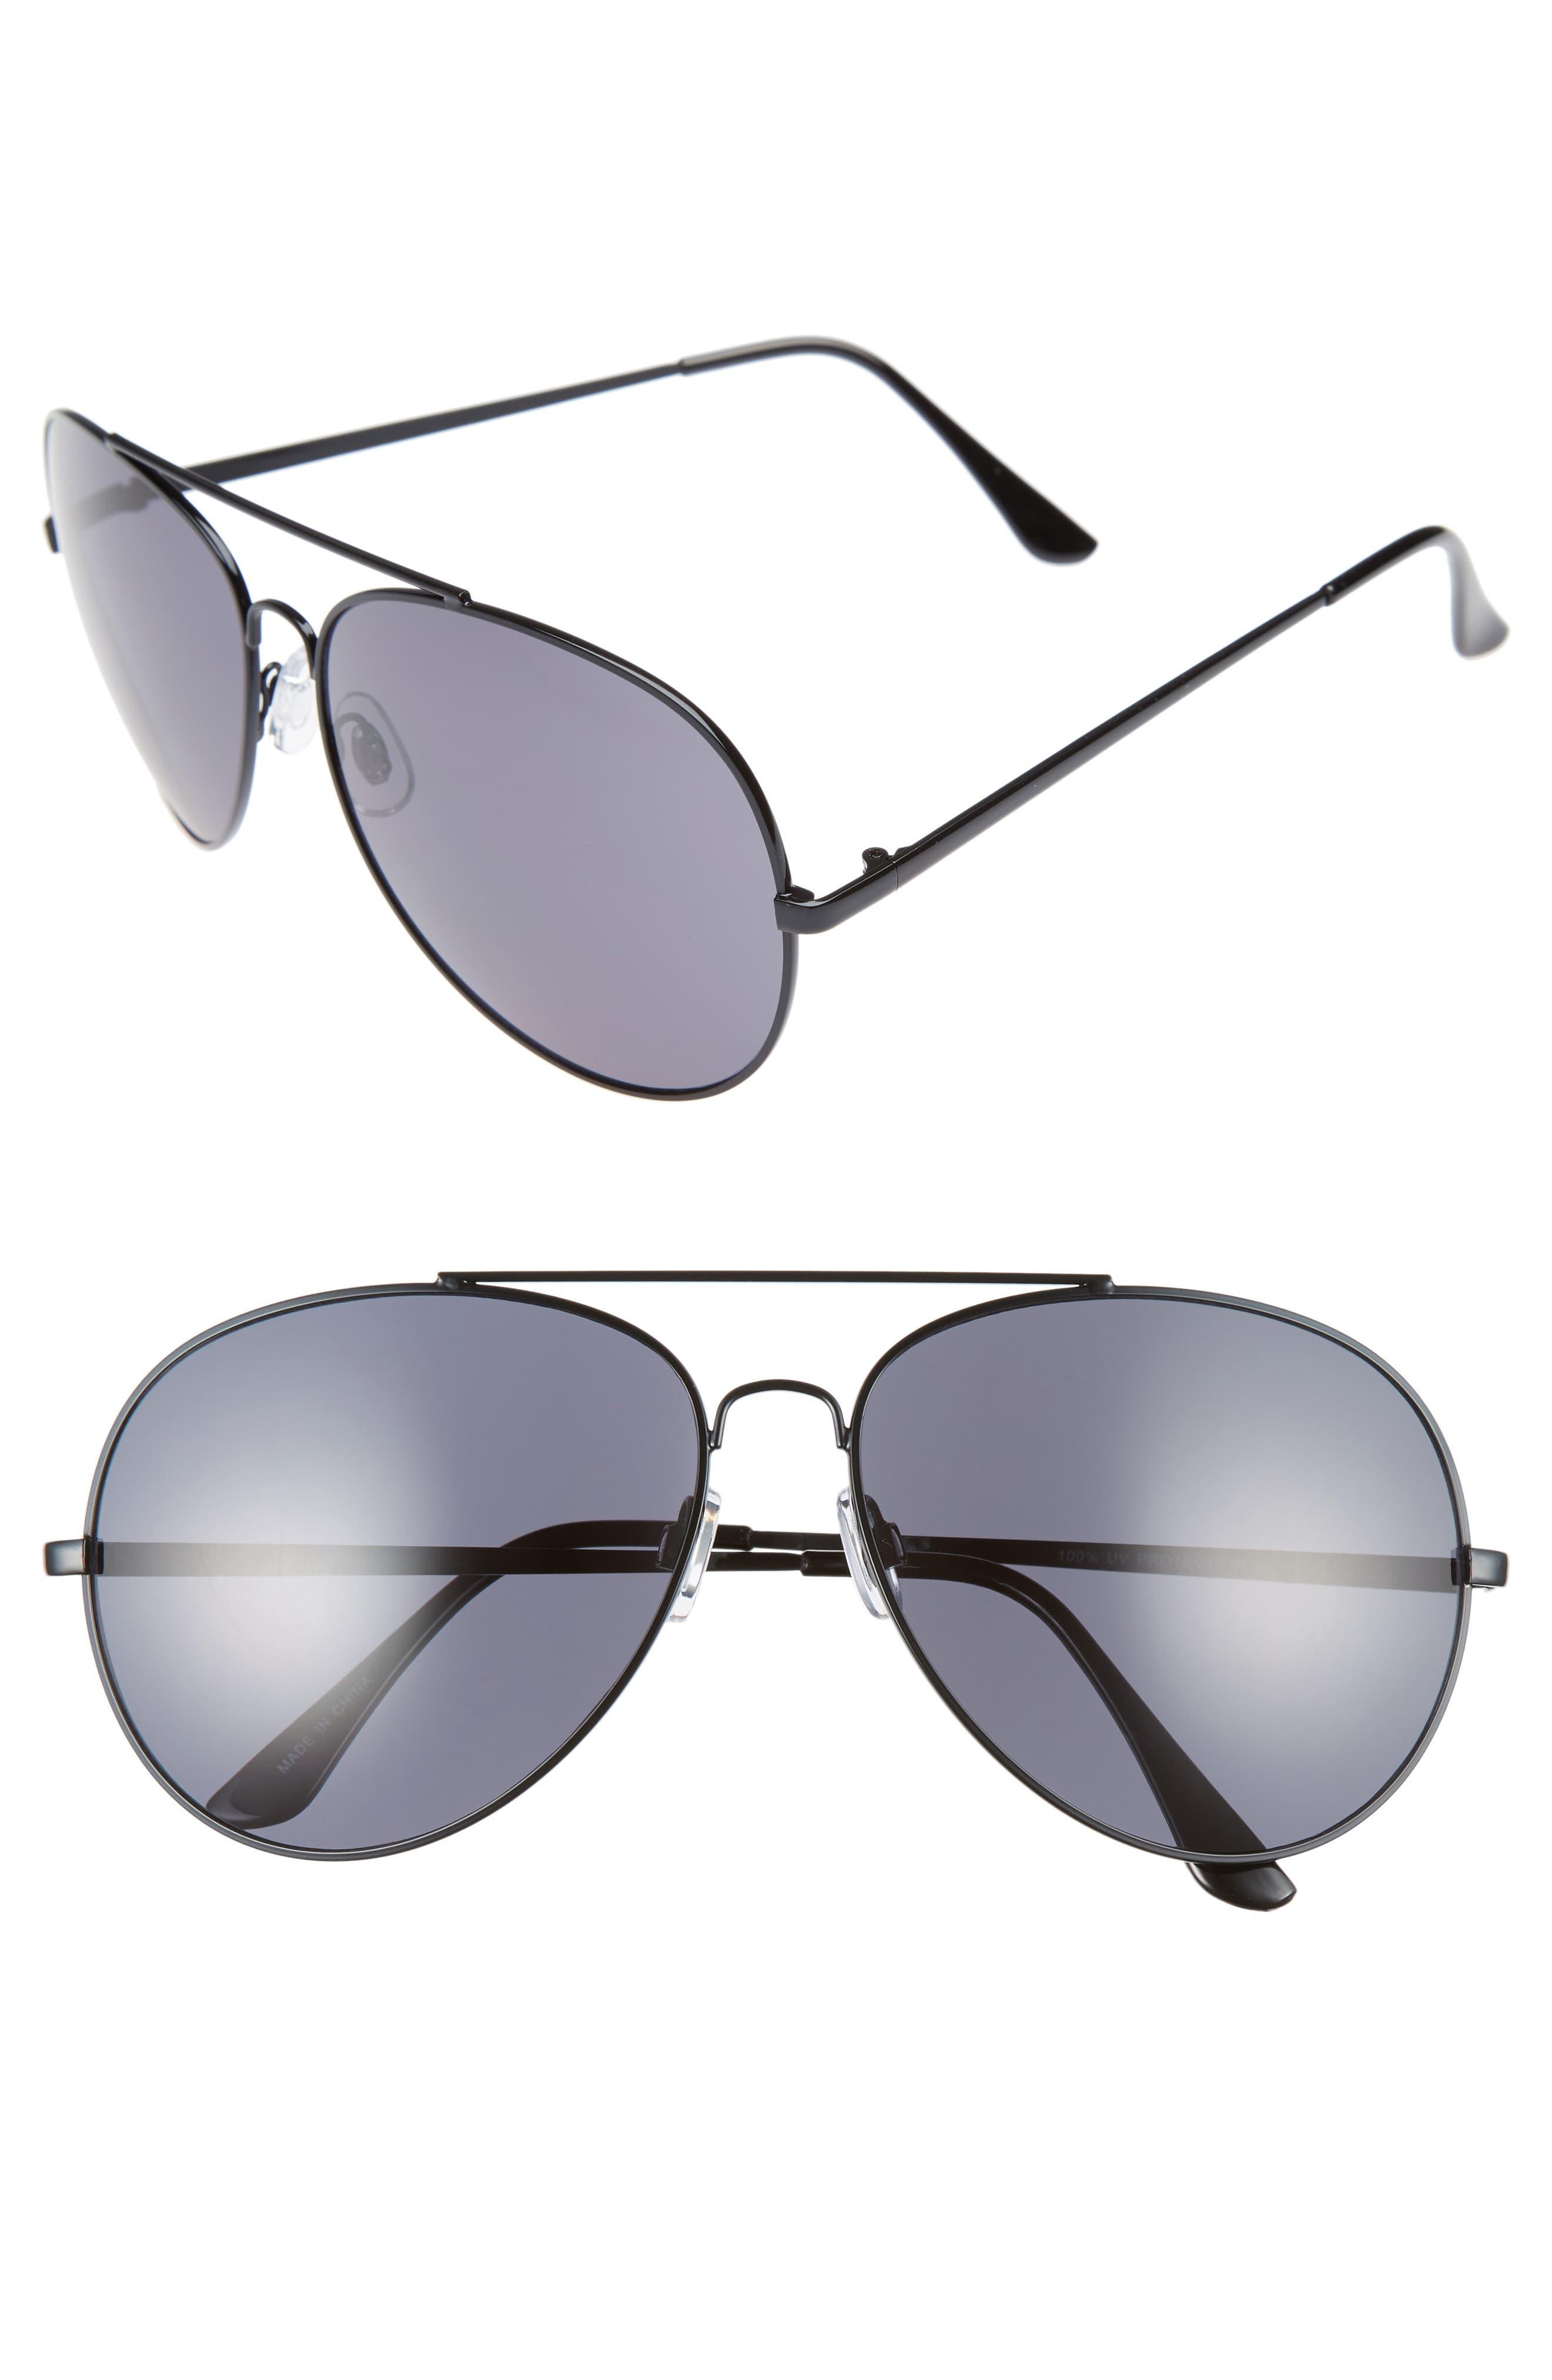 65mm Oversize Aviator Sunglasses,                             Main thumbnail 1, color,                             001